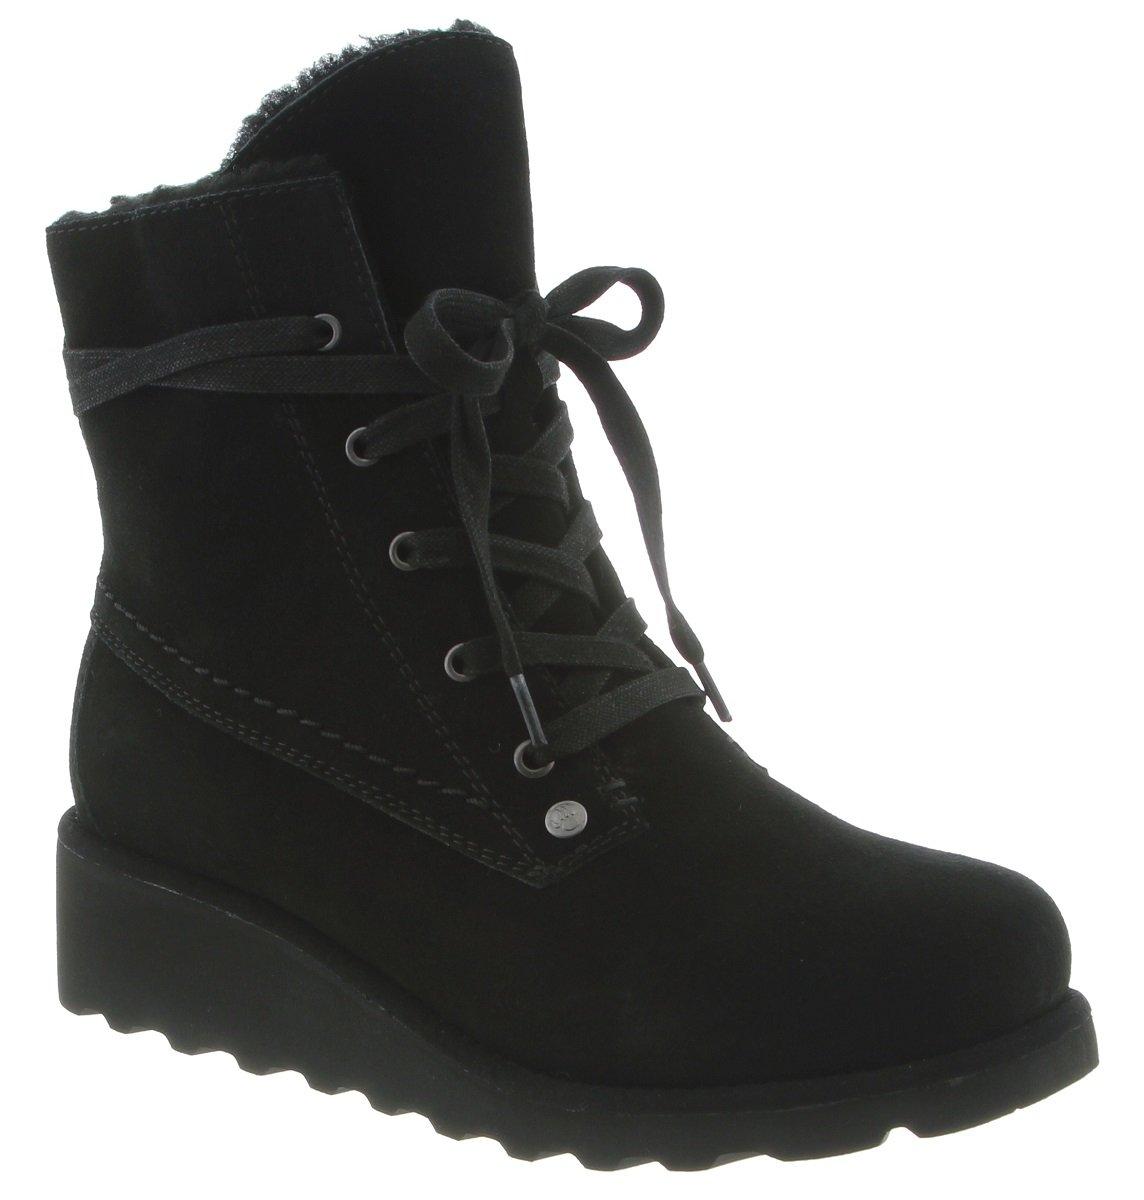 BEARPAW Women's Krista Boots B06XY8CBTX 6 B(M) US|Black Ii